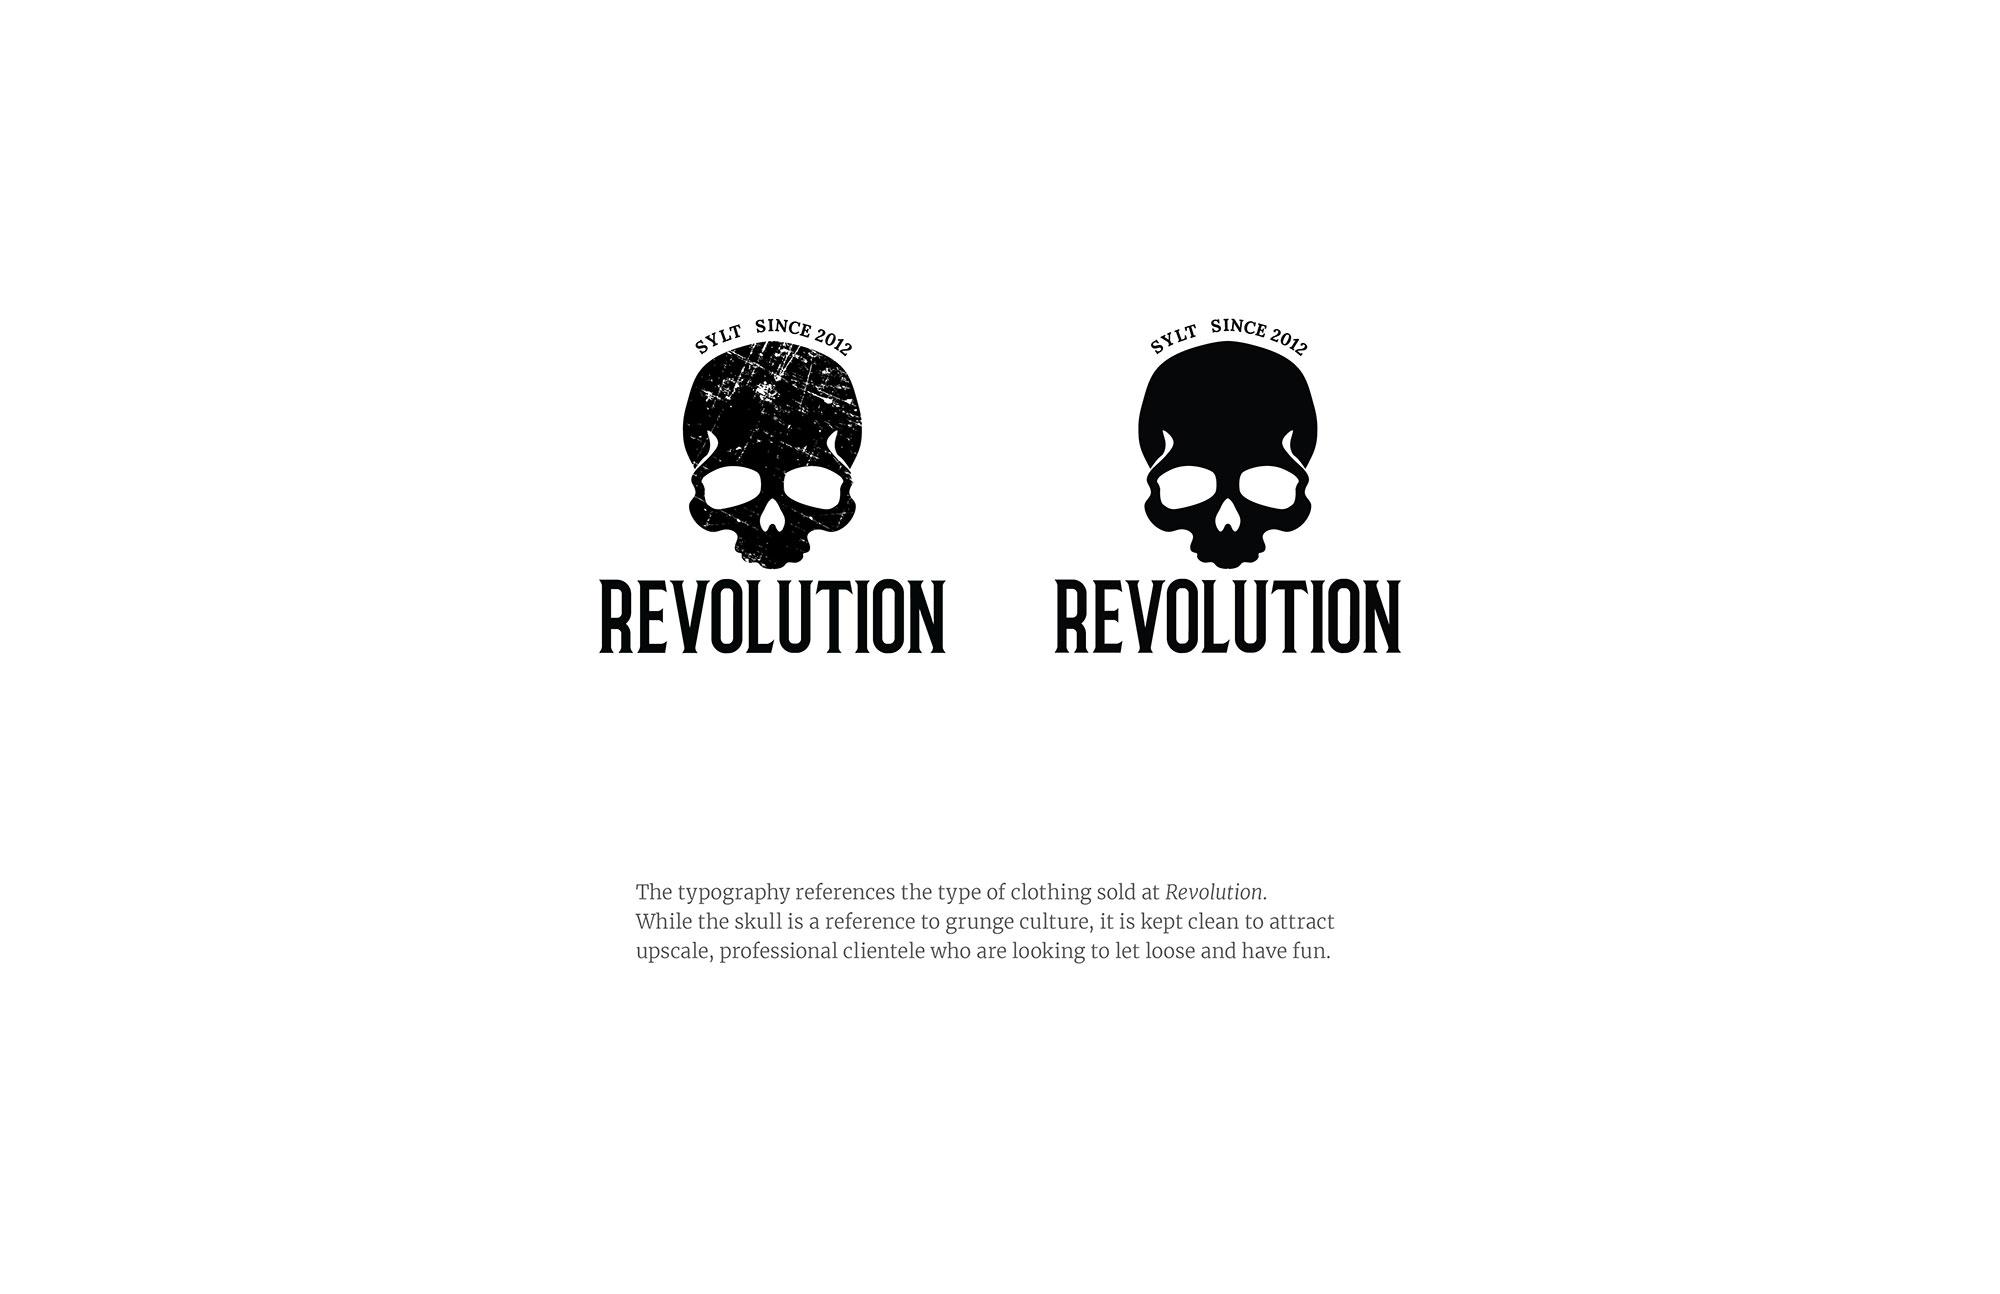 Revolution_Concepts3-1